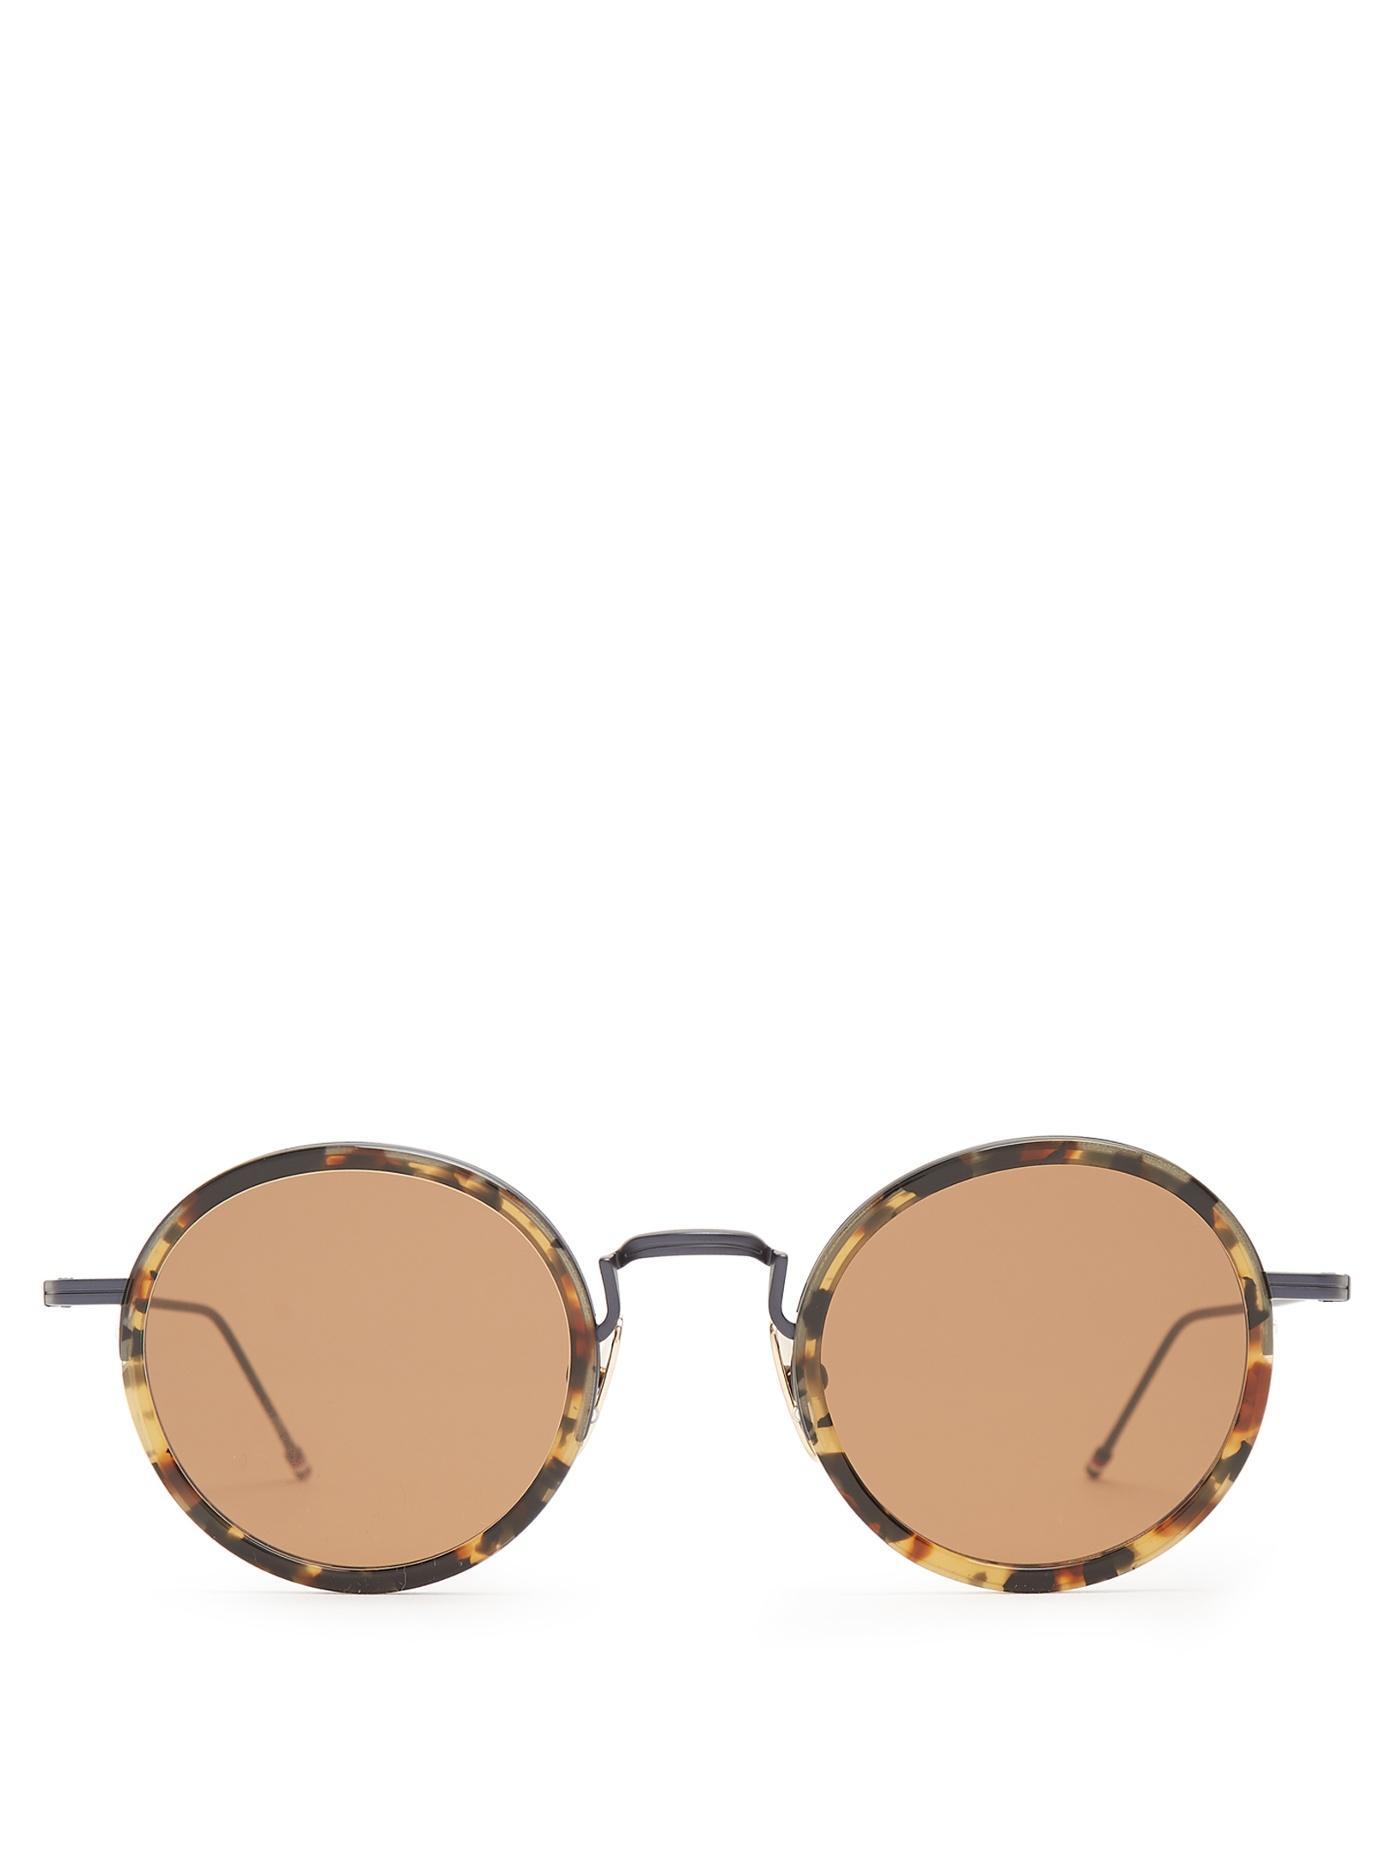 Thom Browne Tokyo Round-Frame Sunglasses In Brown Multi